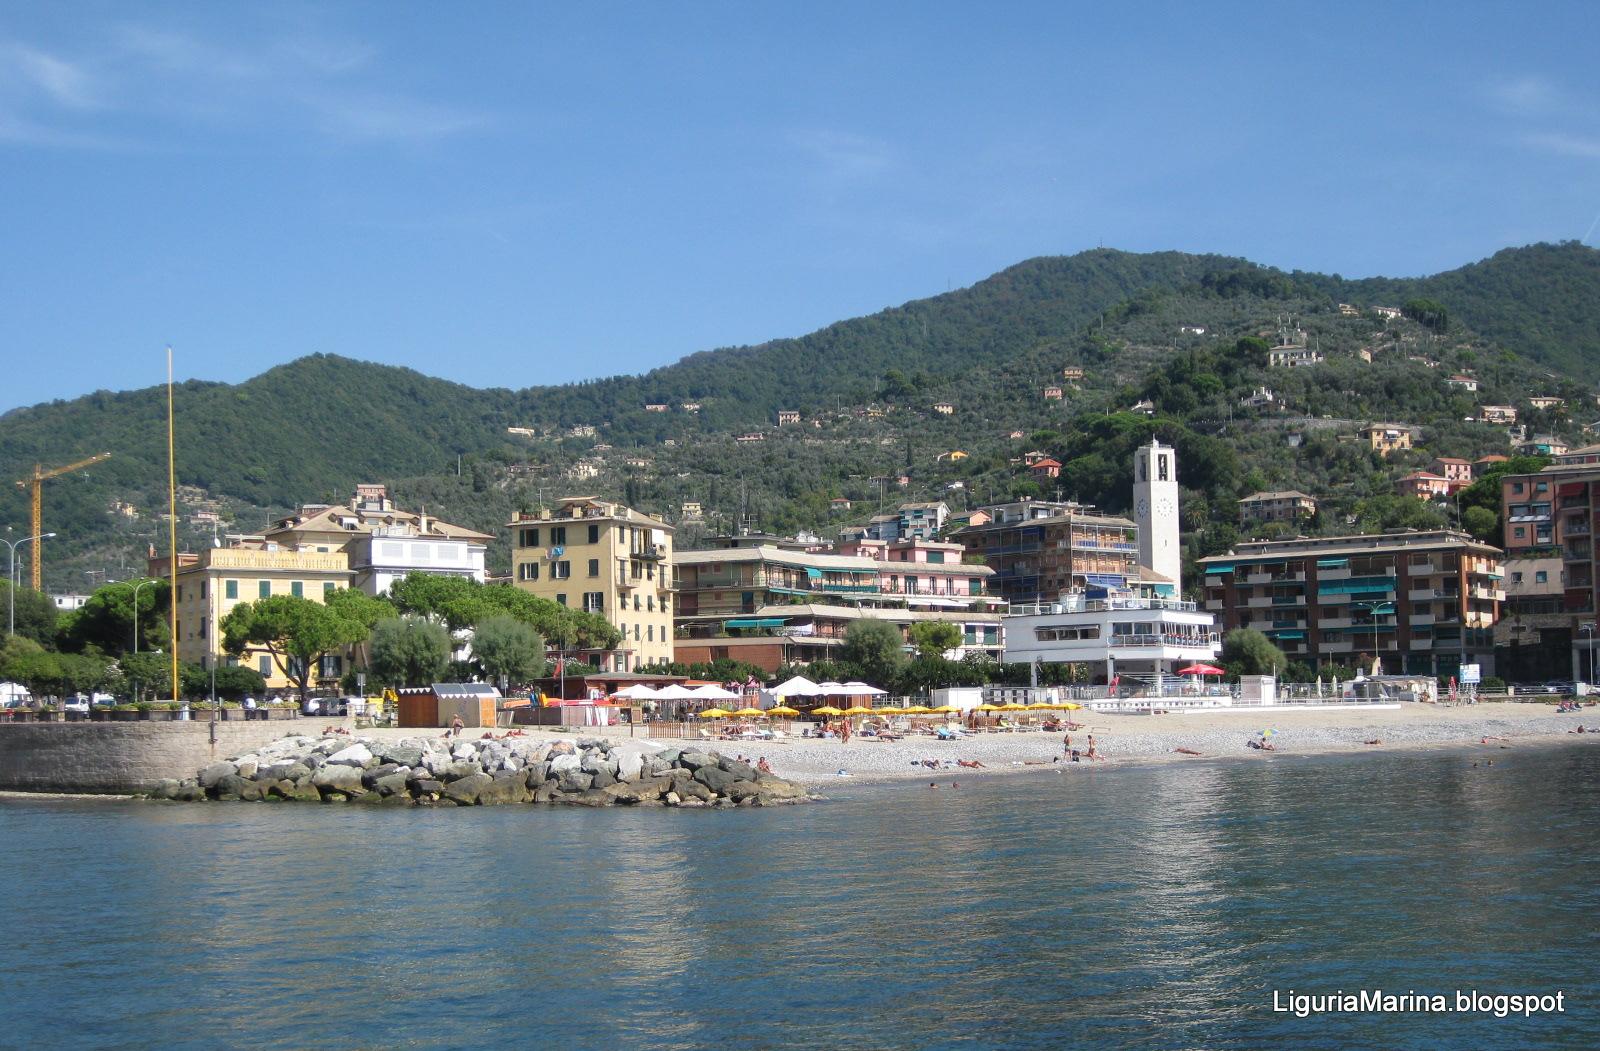 LiguriaMarina gennaio 2012